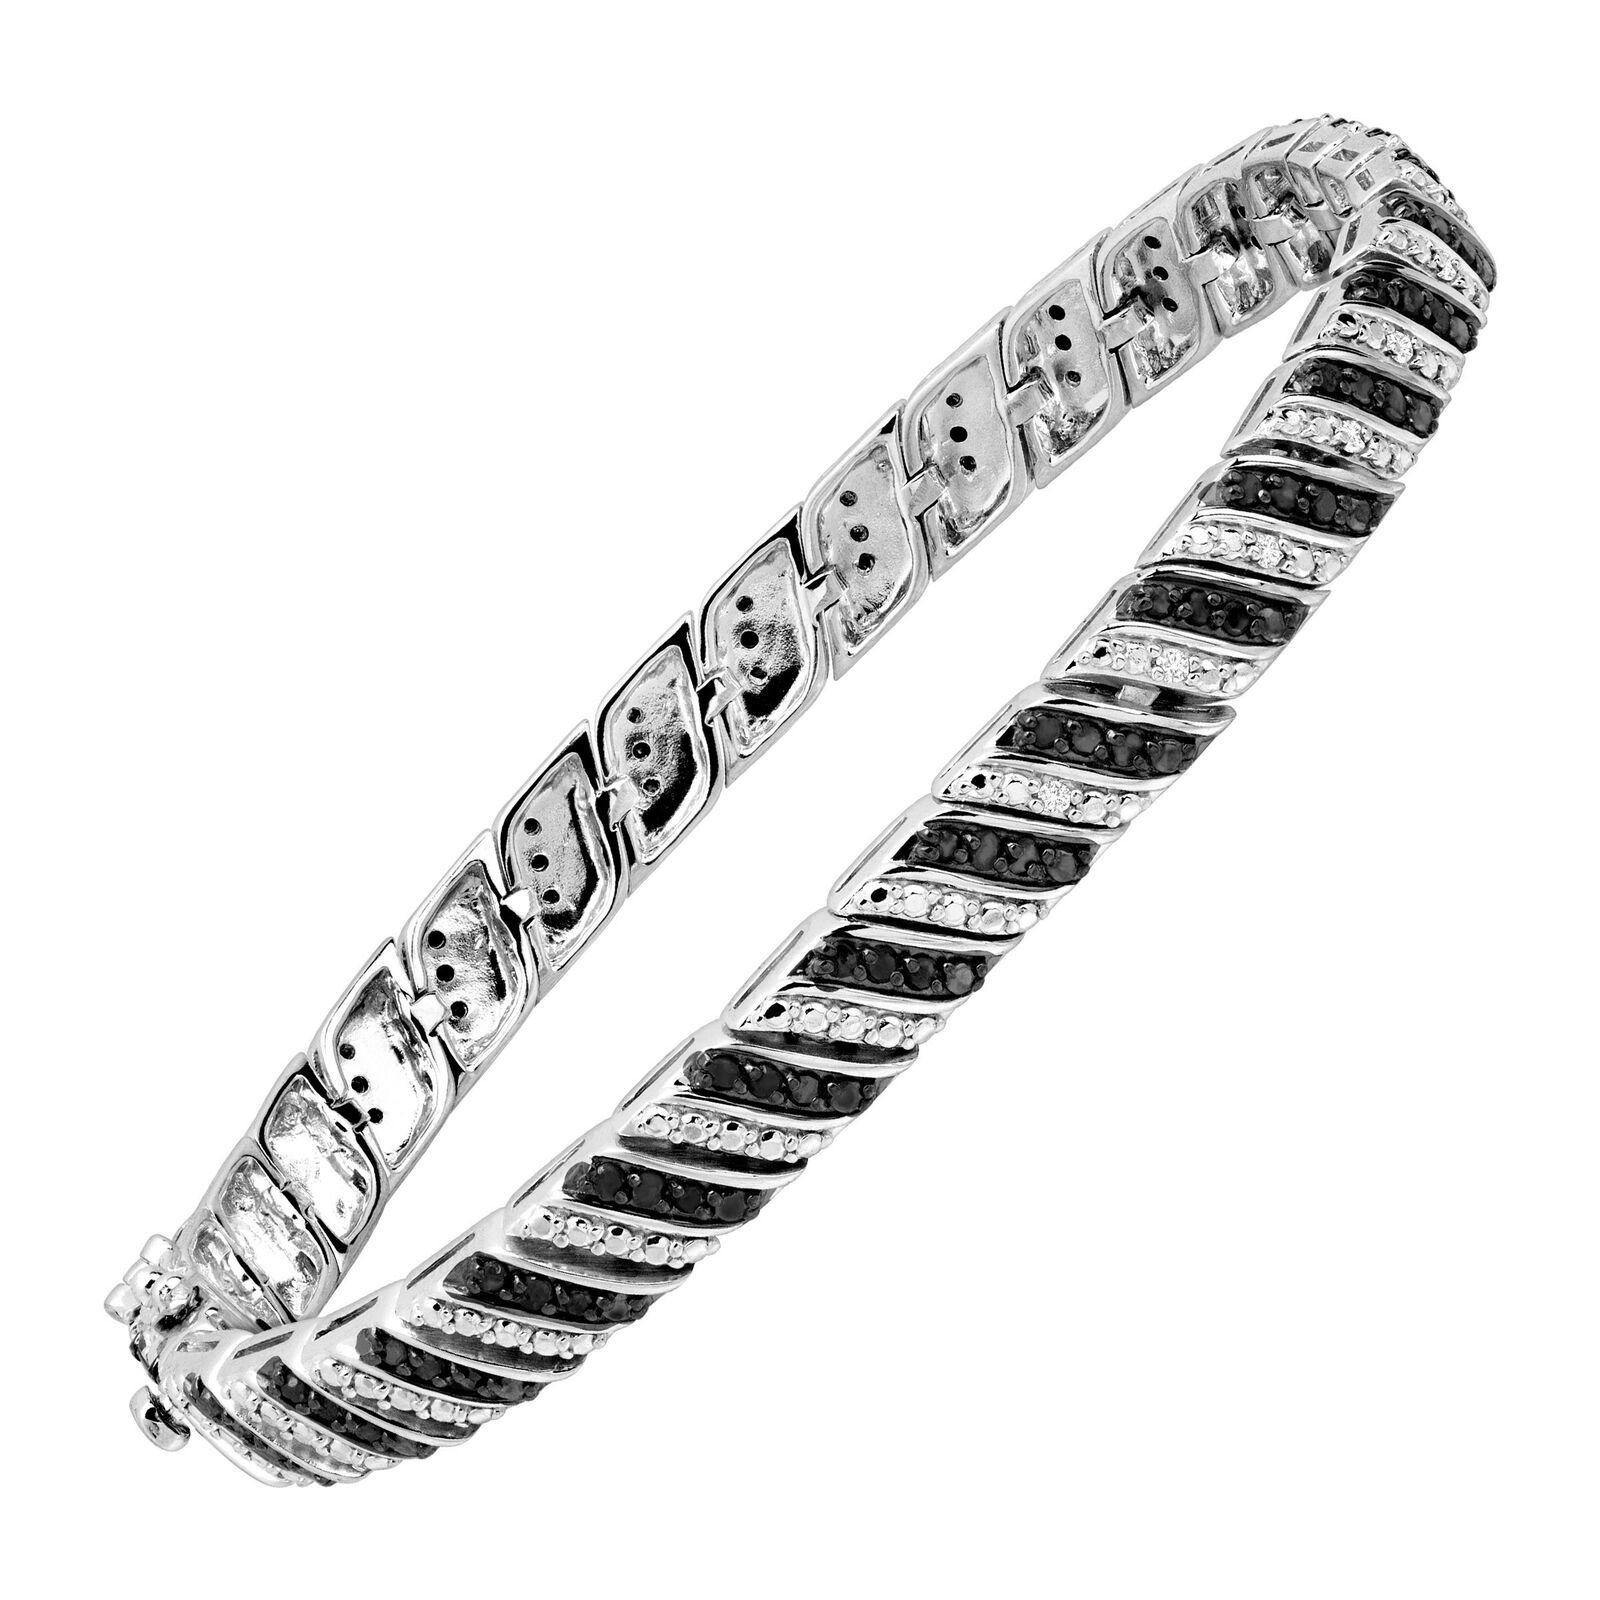 1 Ct Black White Diamond Tennis Bracelet In Sterling Silver Tennis Bracelet Diamond Black Diamond Bracelet Tennis Bracelet